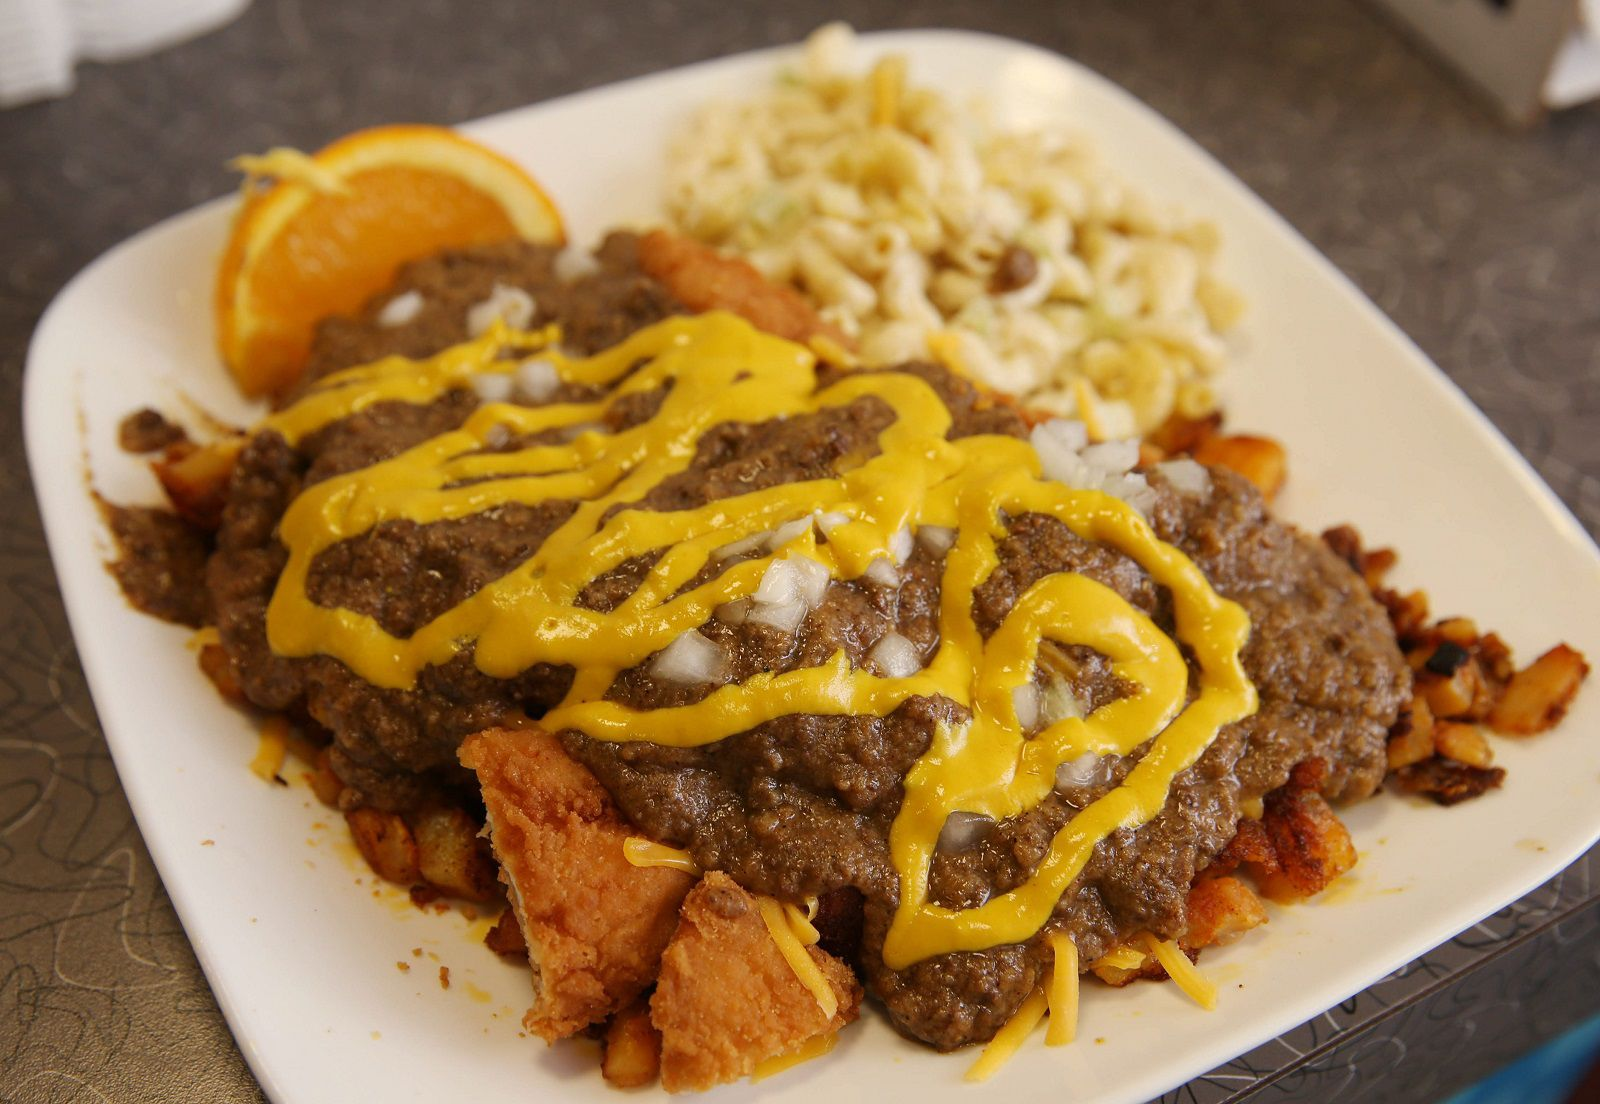 Buffalo S Closest Efforts To Mimicking Nick Tahou Hots Garbage Plate Dining Buffalonews Com